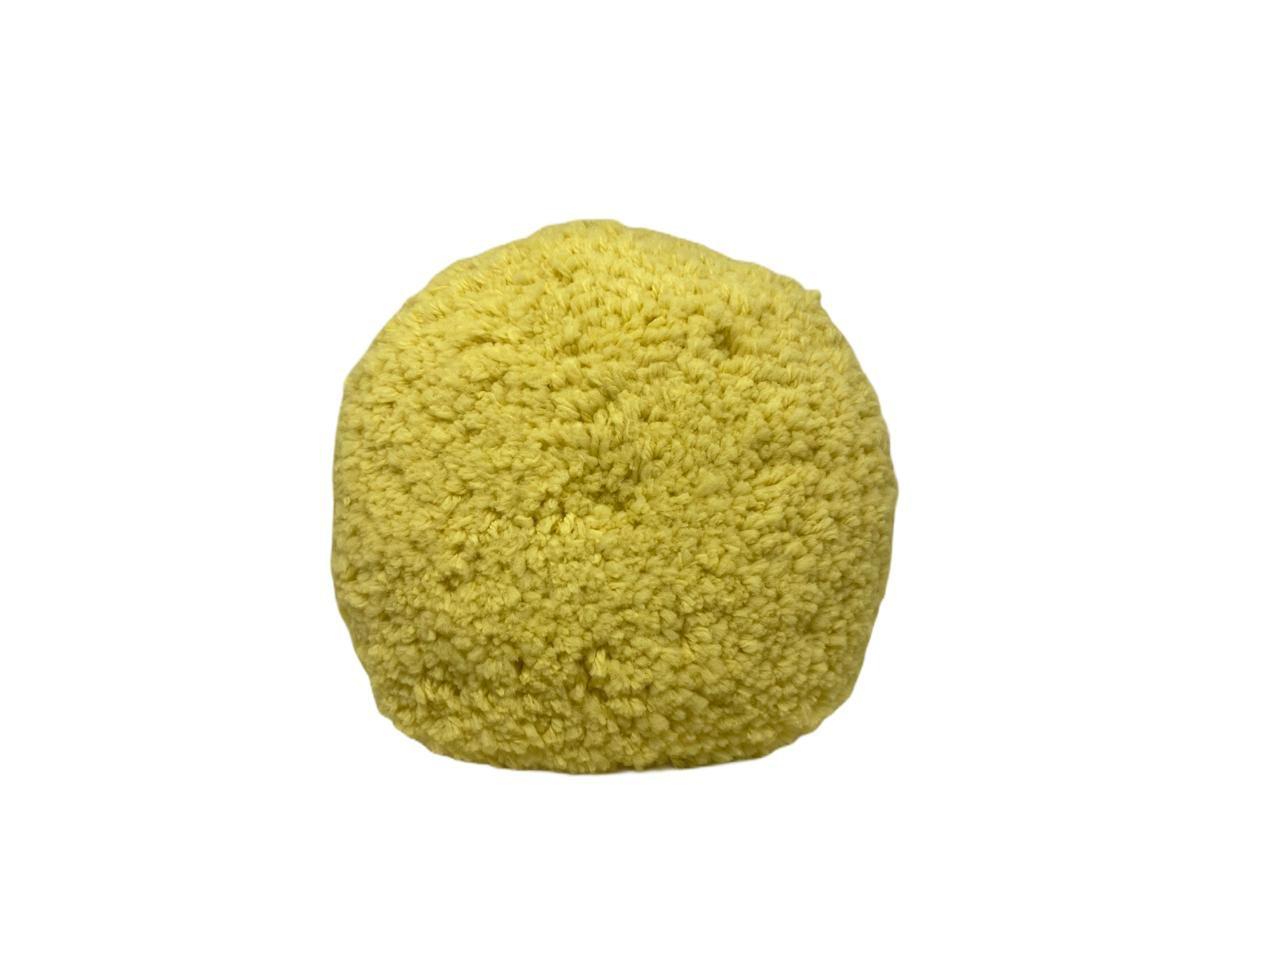 Boina Dupla Face Amarela Macia Polimento 8'' Lincoln